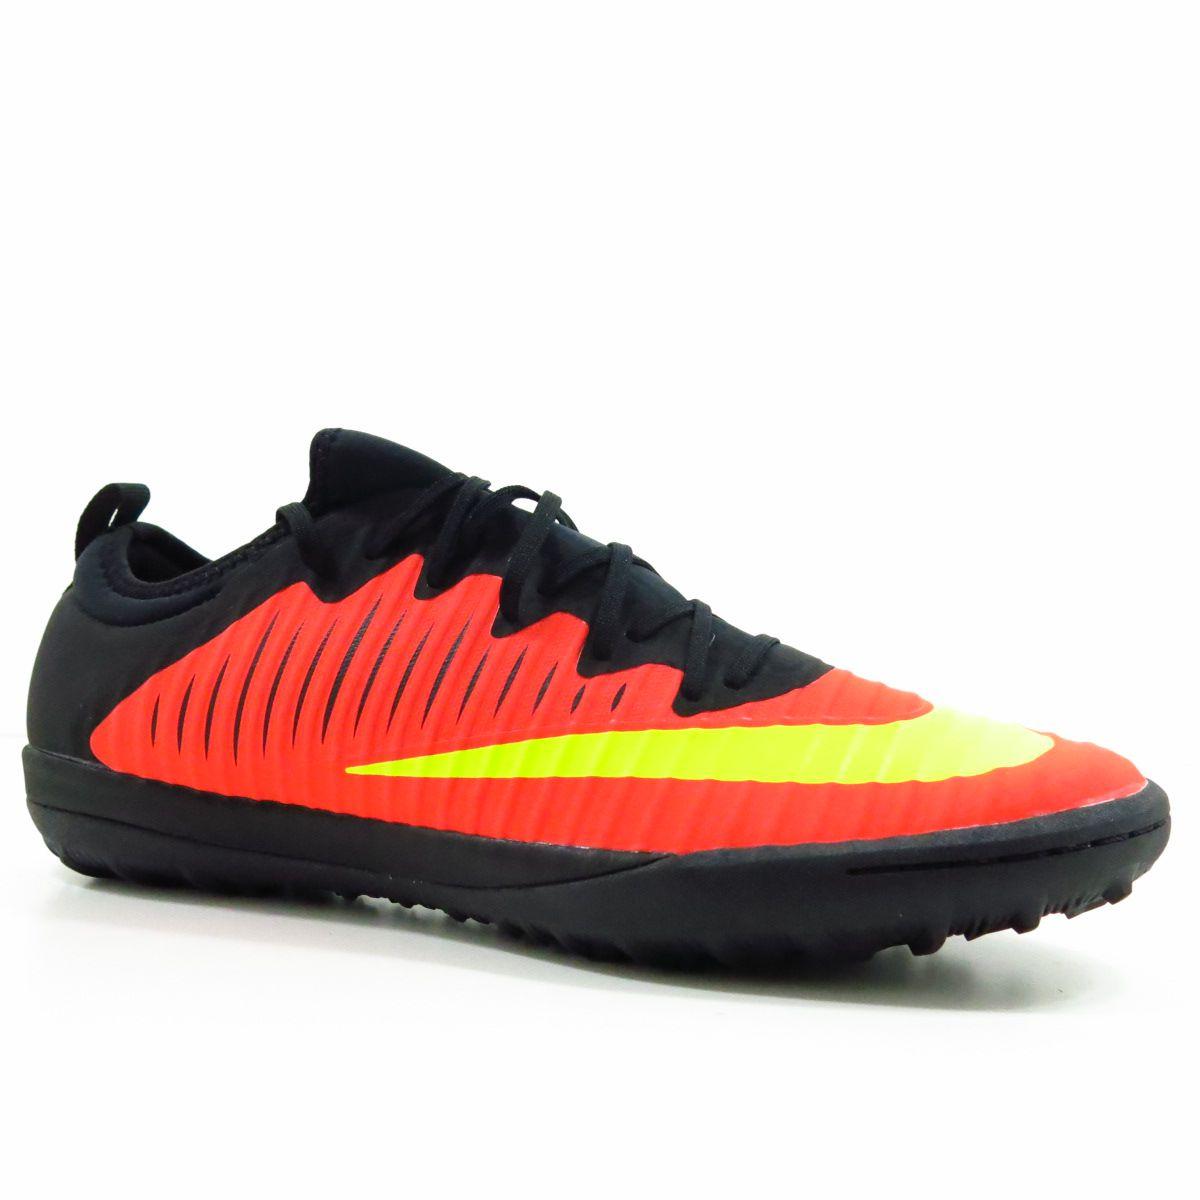 Chuteira Society Nike MercurialX Finale TF